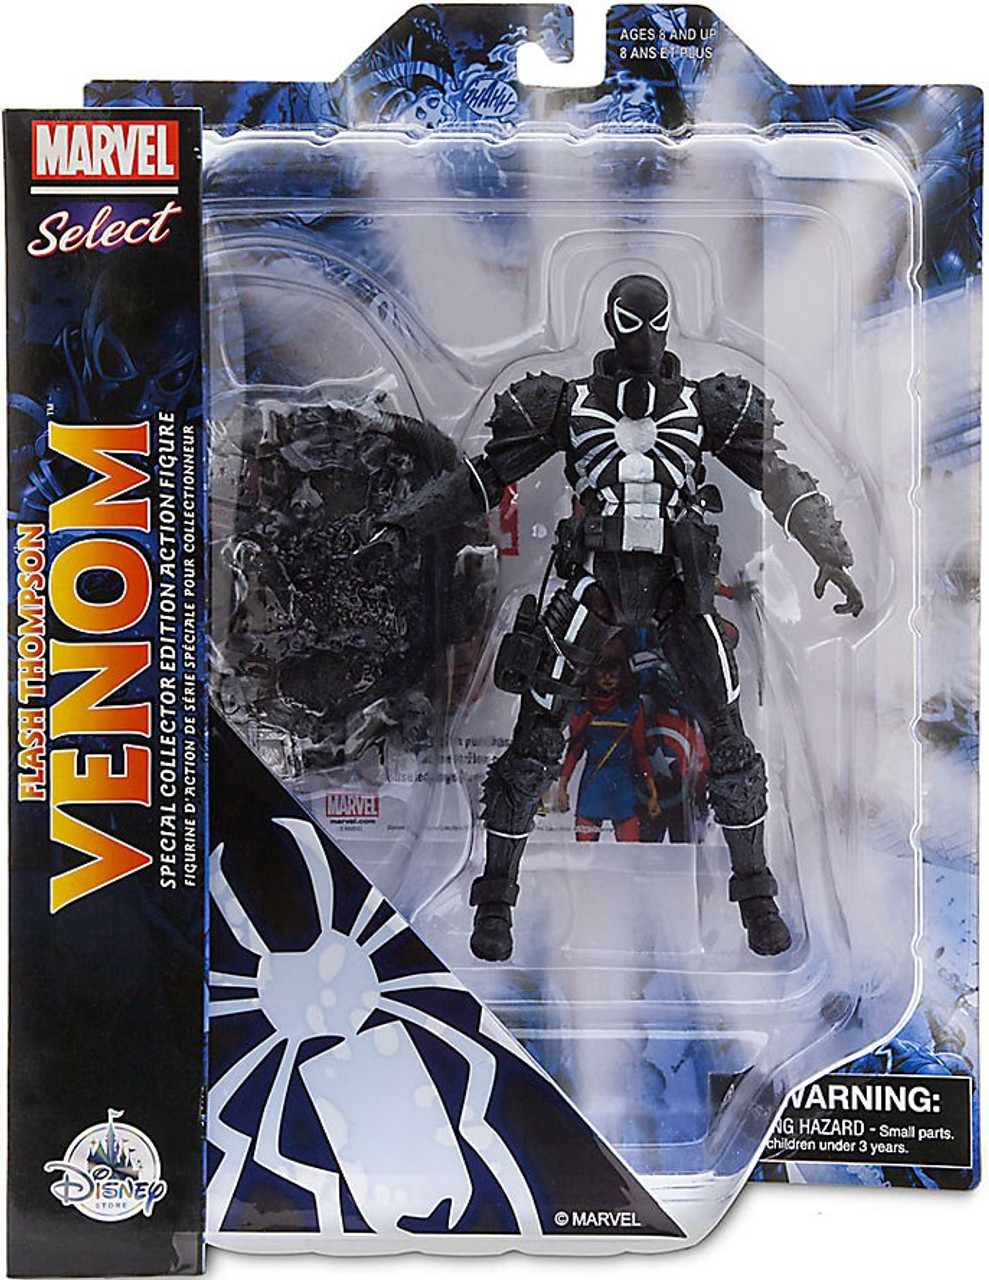 Marvel Marvel Select Flash Thompson Venom Exclusive 7 Action Figure